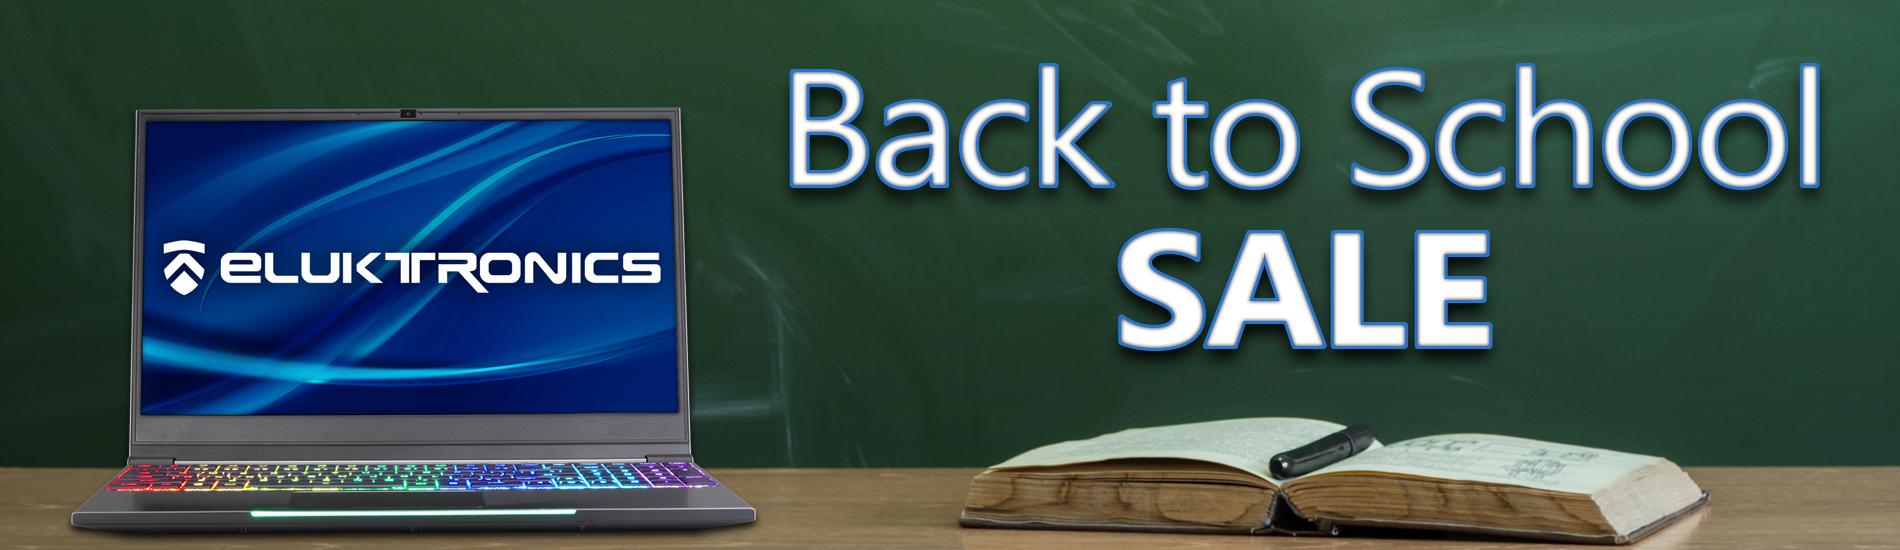 amazon-pay-back-2-school.jpg